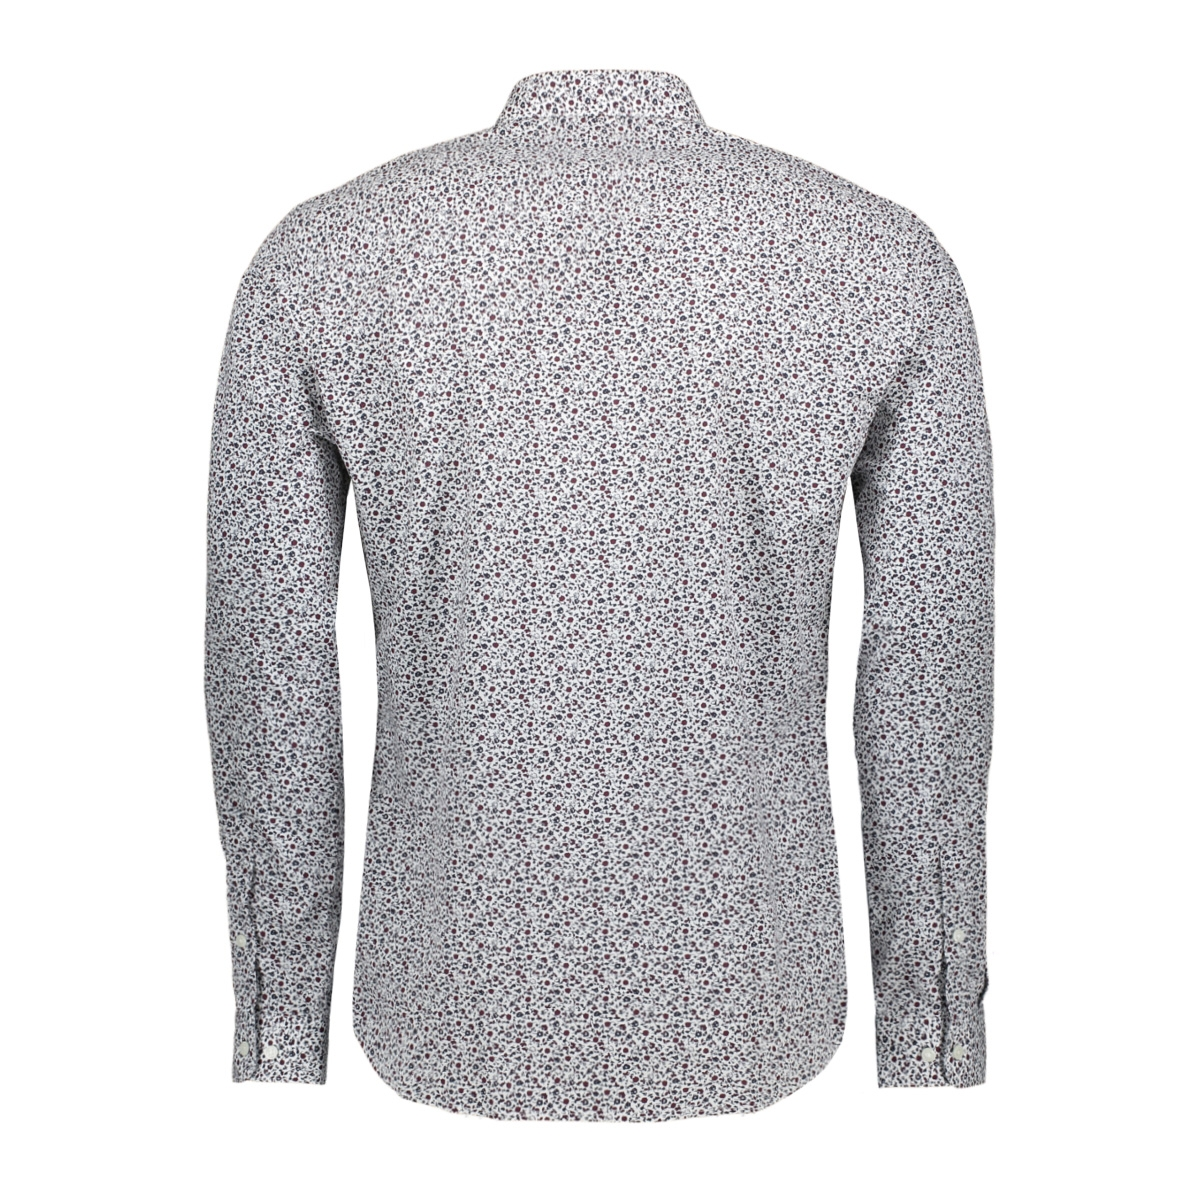 jprblackburn shirt l/s w19 12162111 jack & jones overhemd white/slim fit